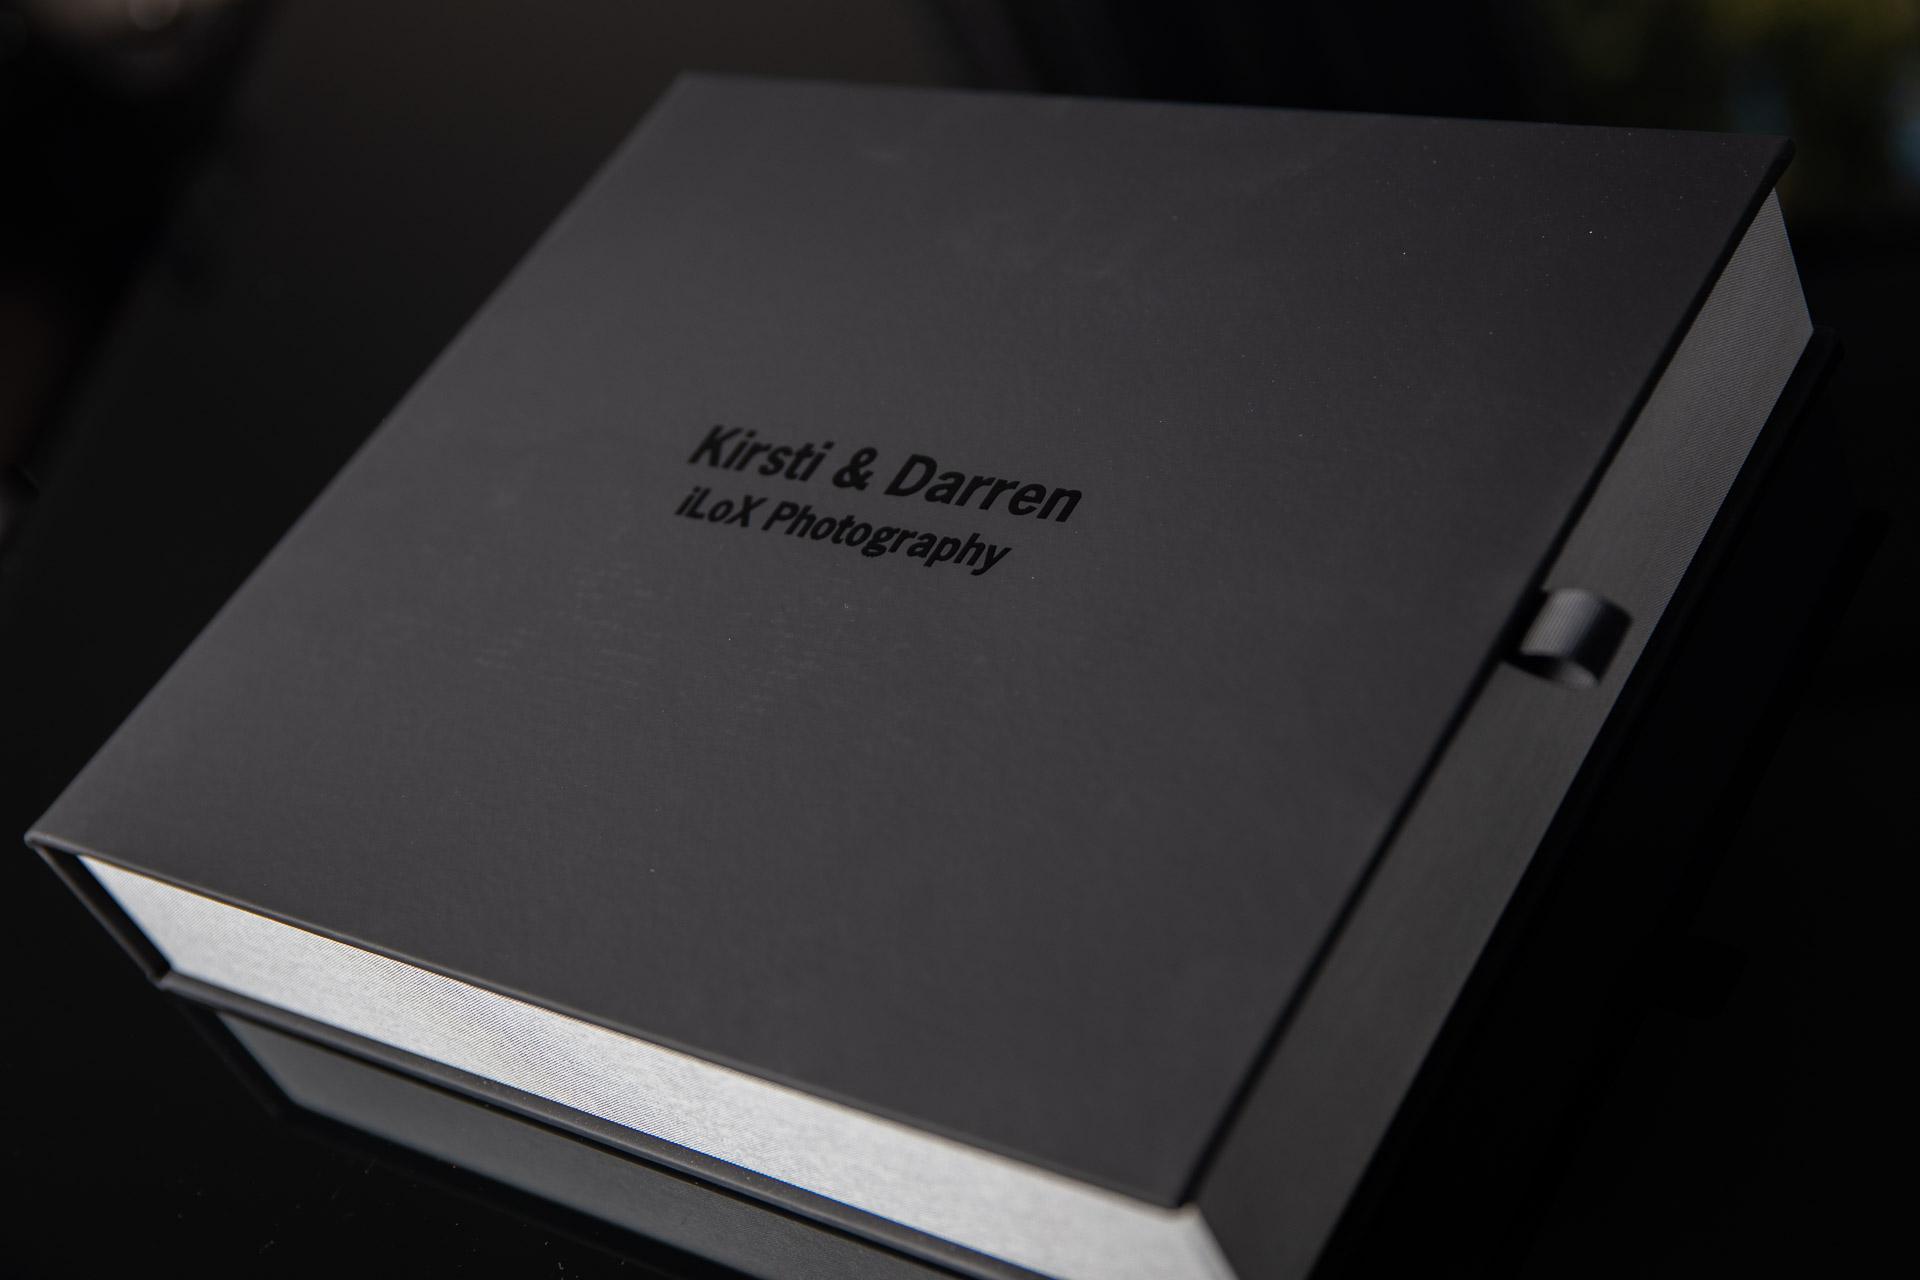 Soft touch wedding album box